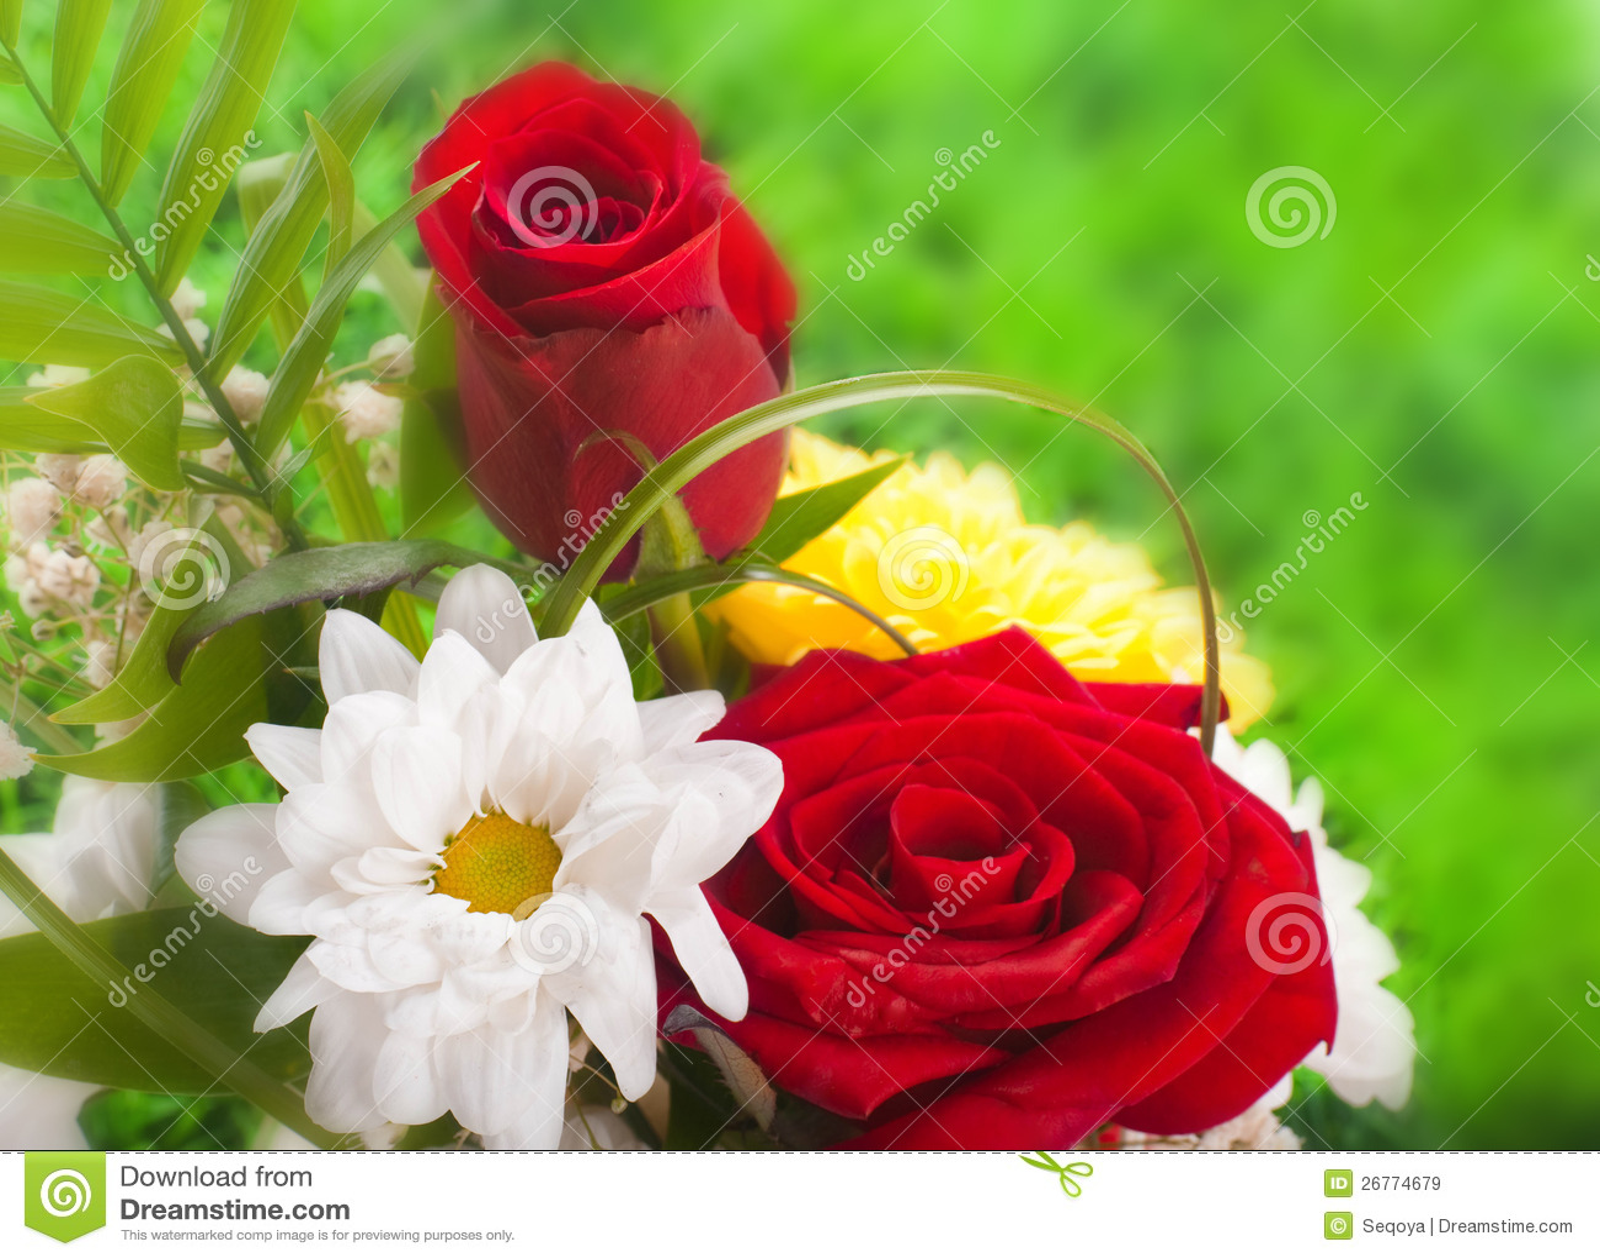 Imagenes de rosas car interior design - Fotos de flores bonitas ...